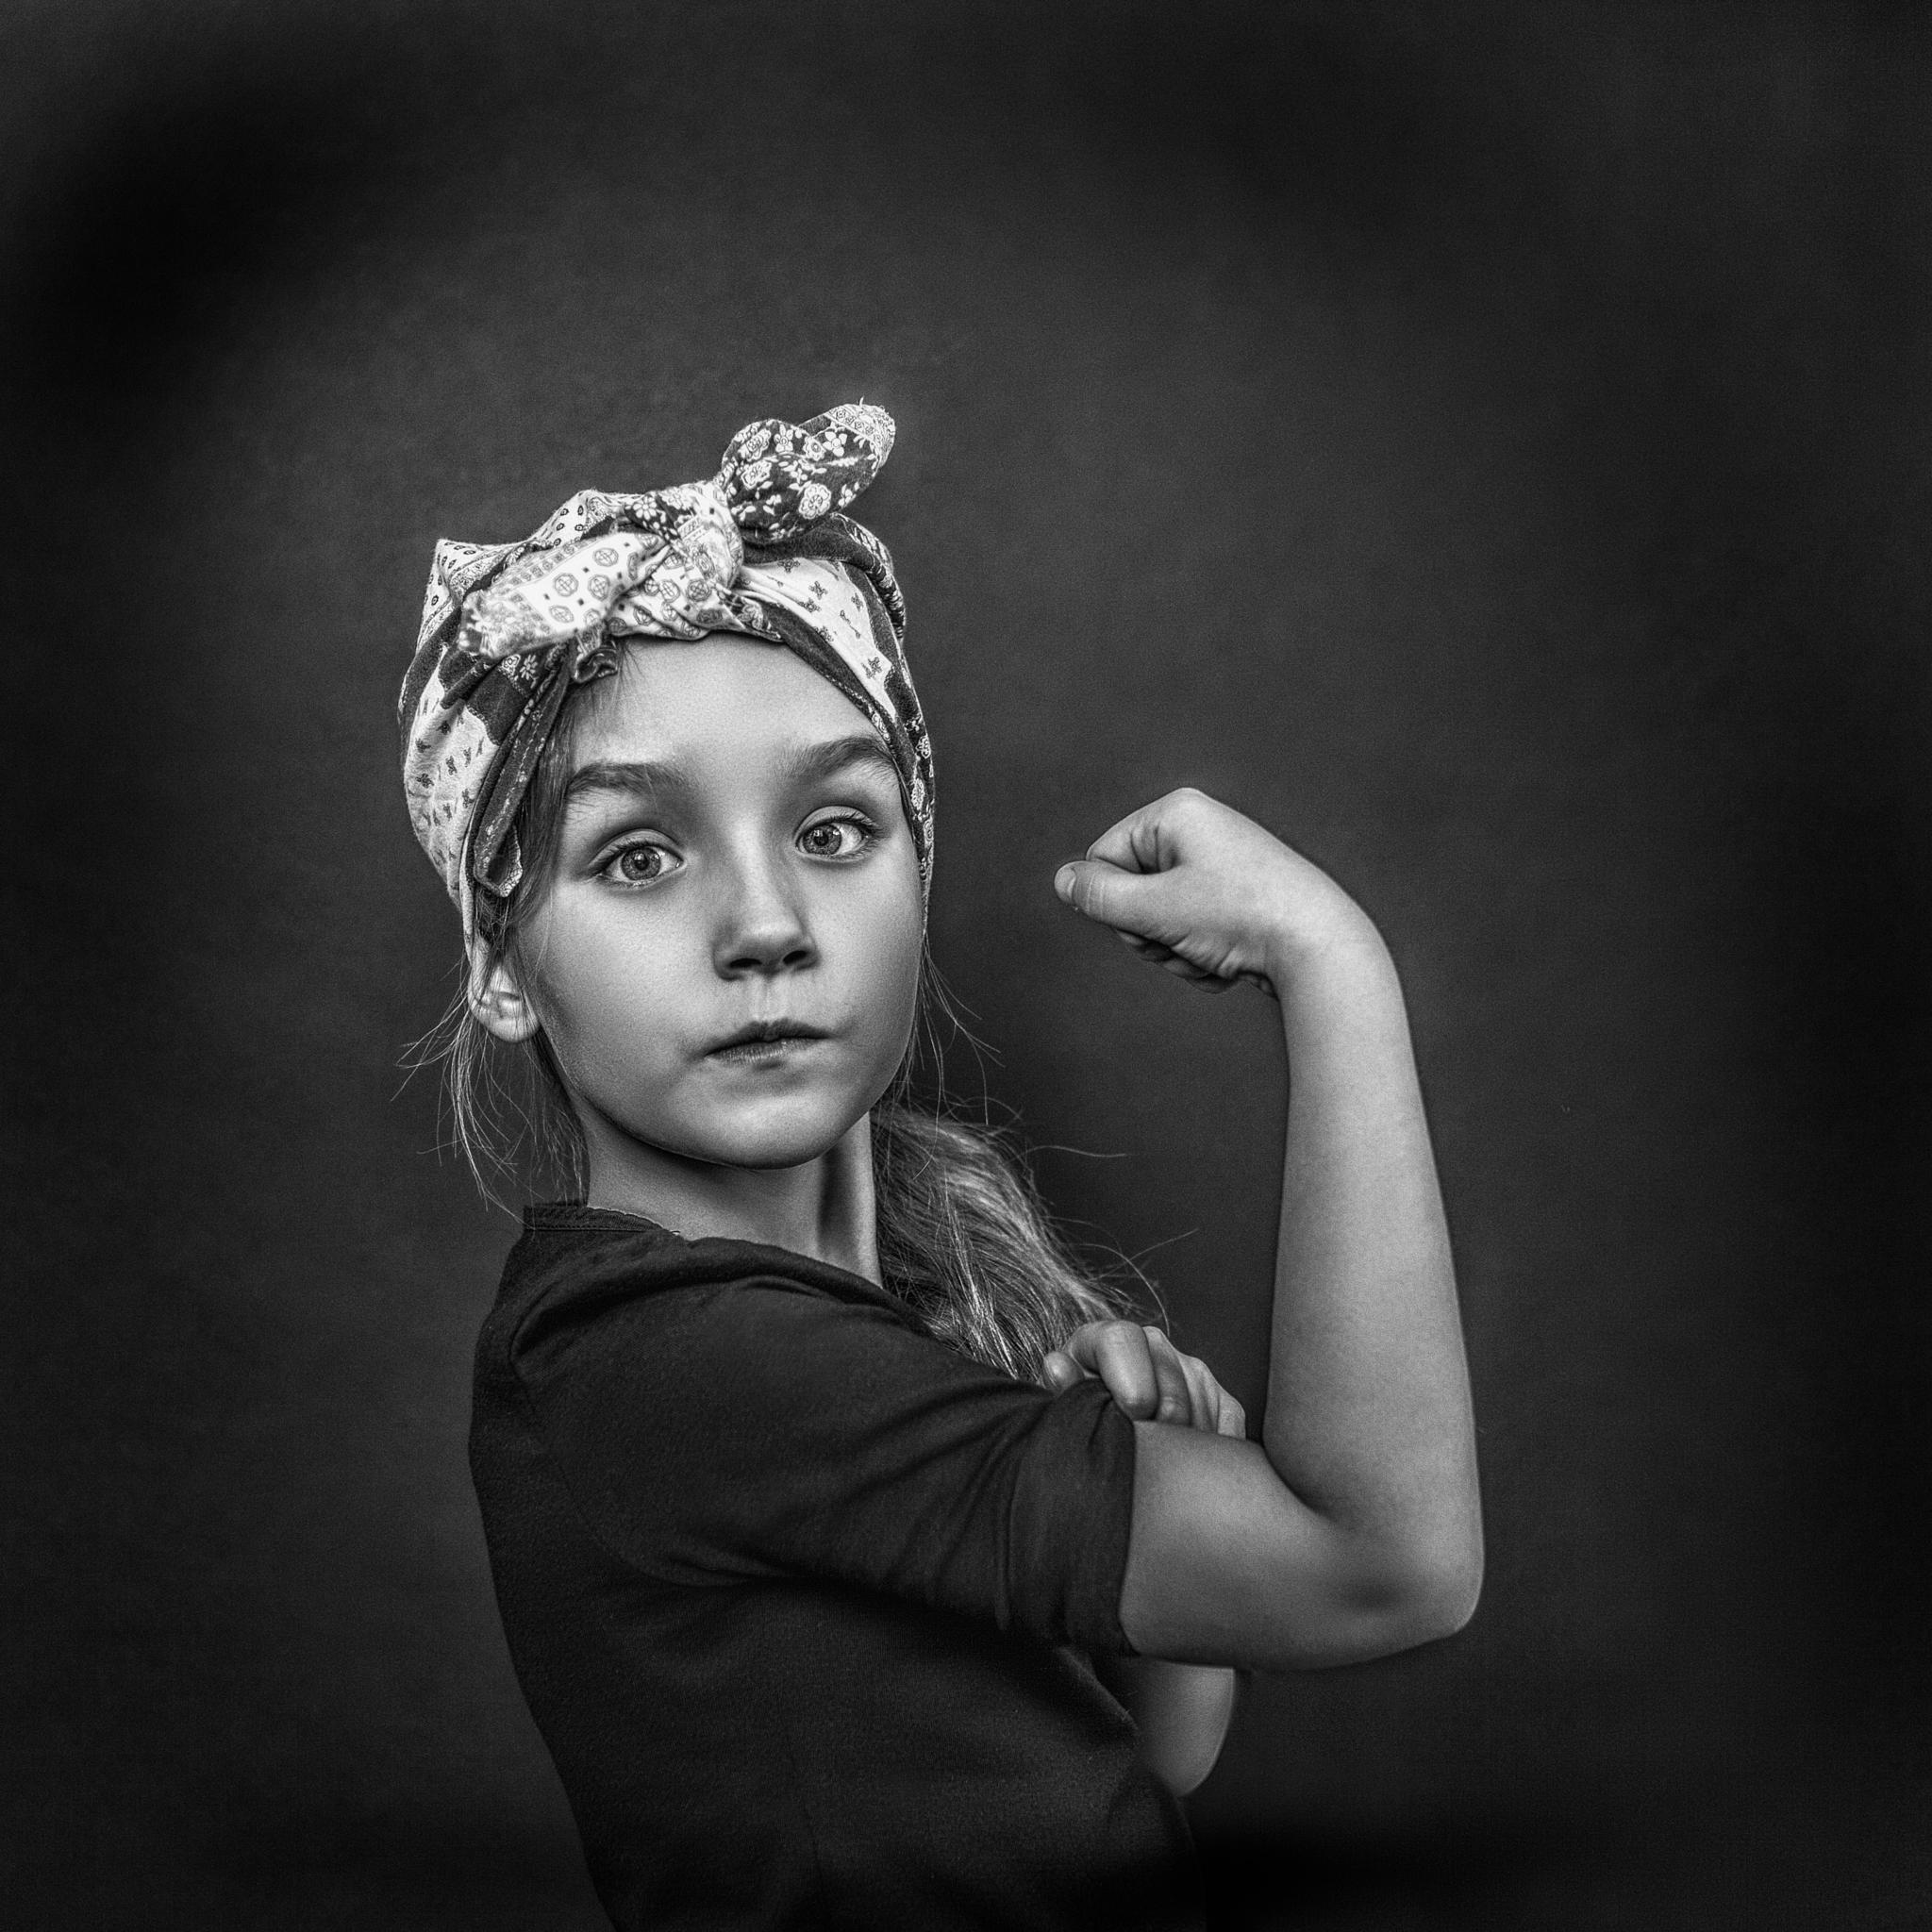 Girl power by Bas Pisa